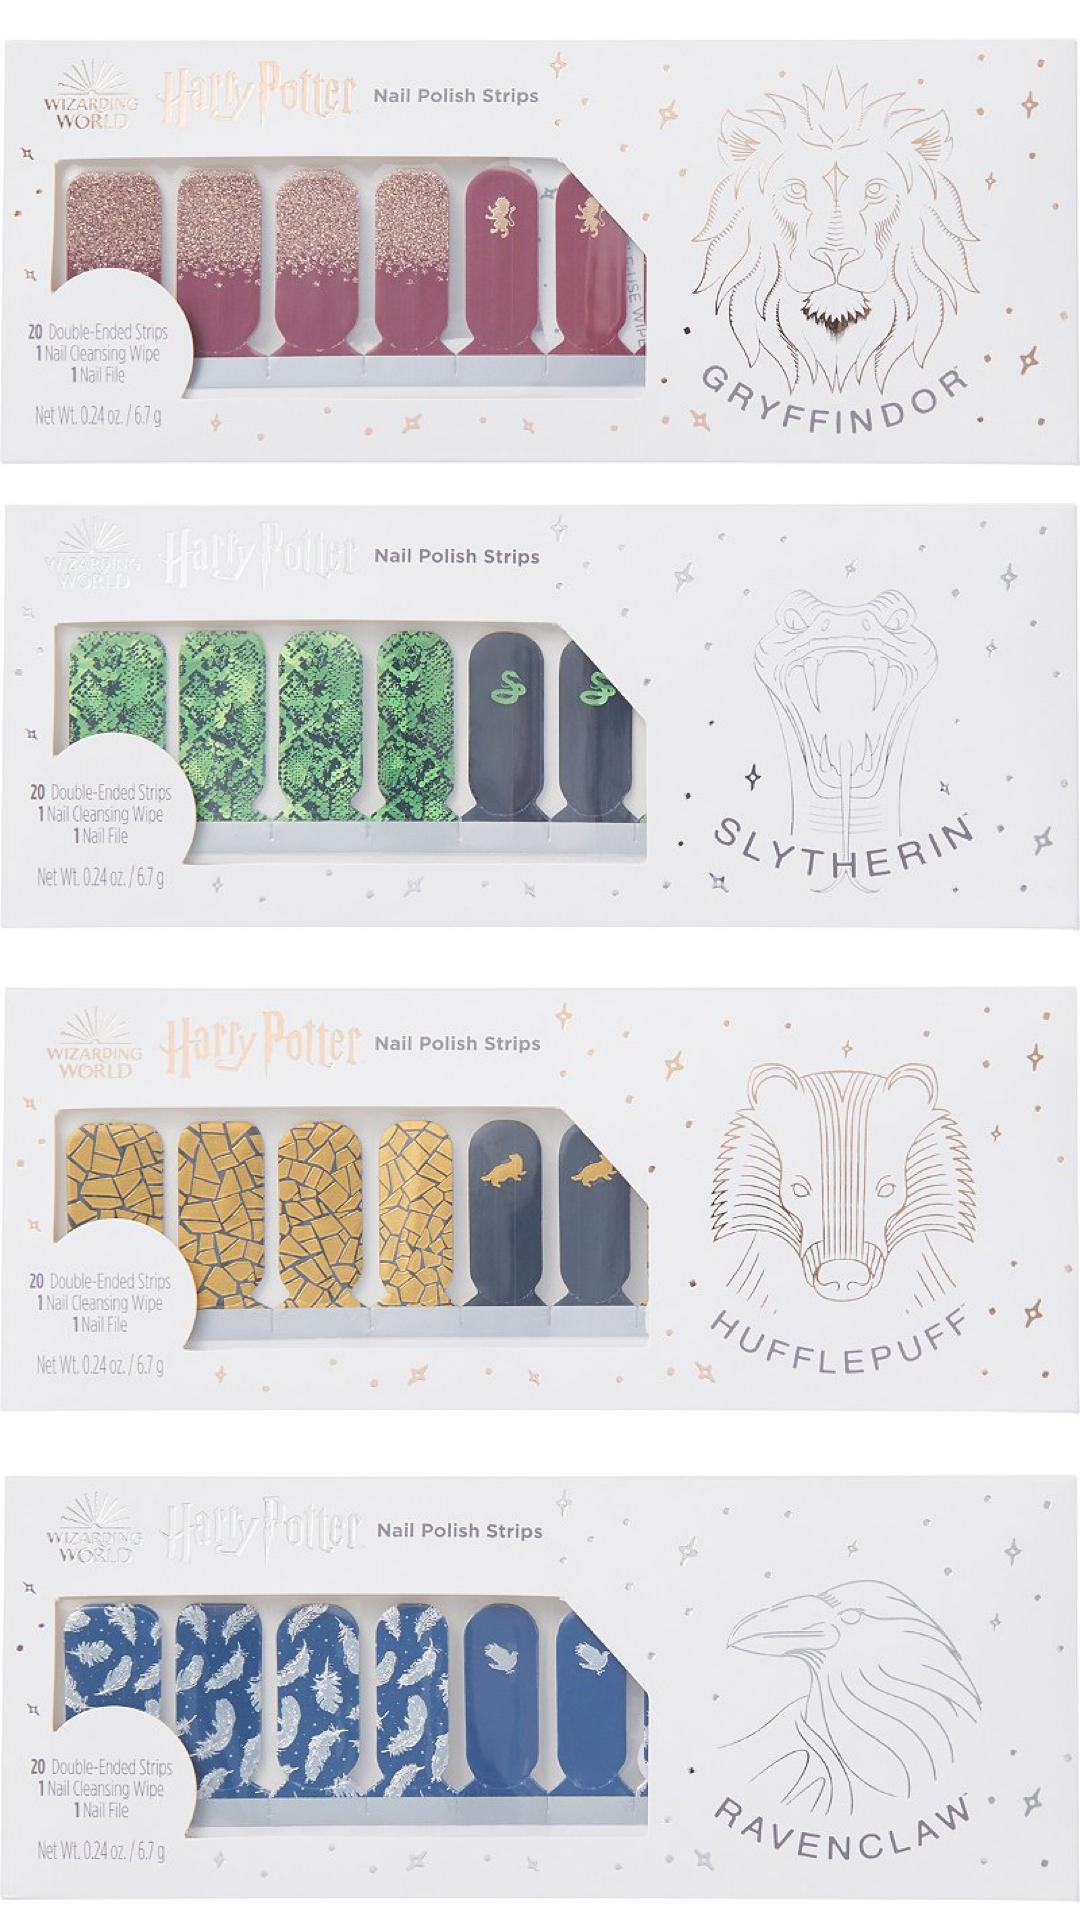 ULTA x Harry Potter Nail Polish Strips